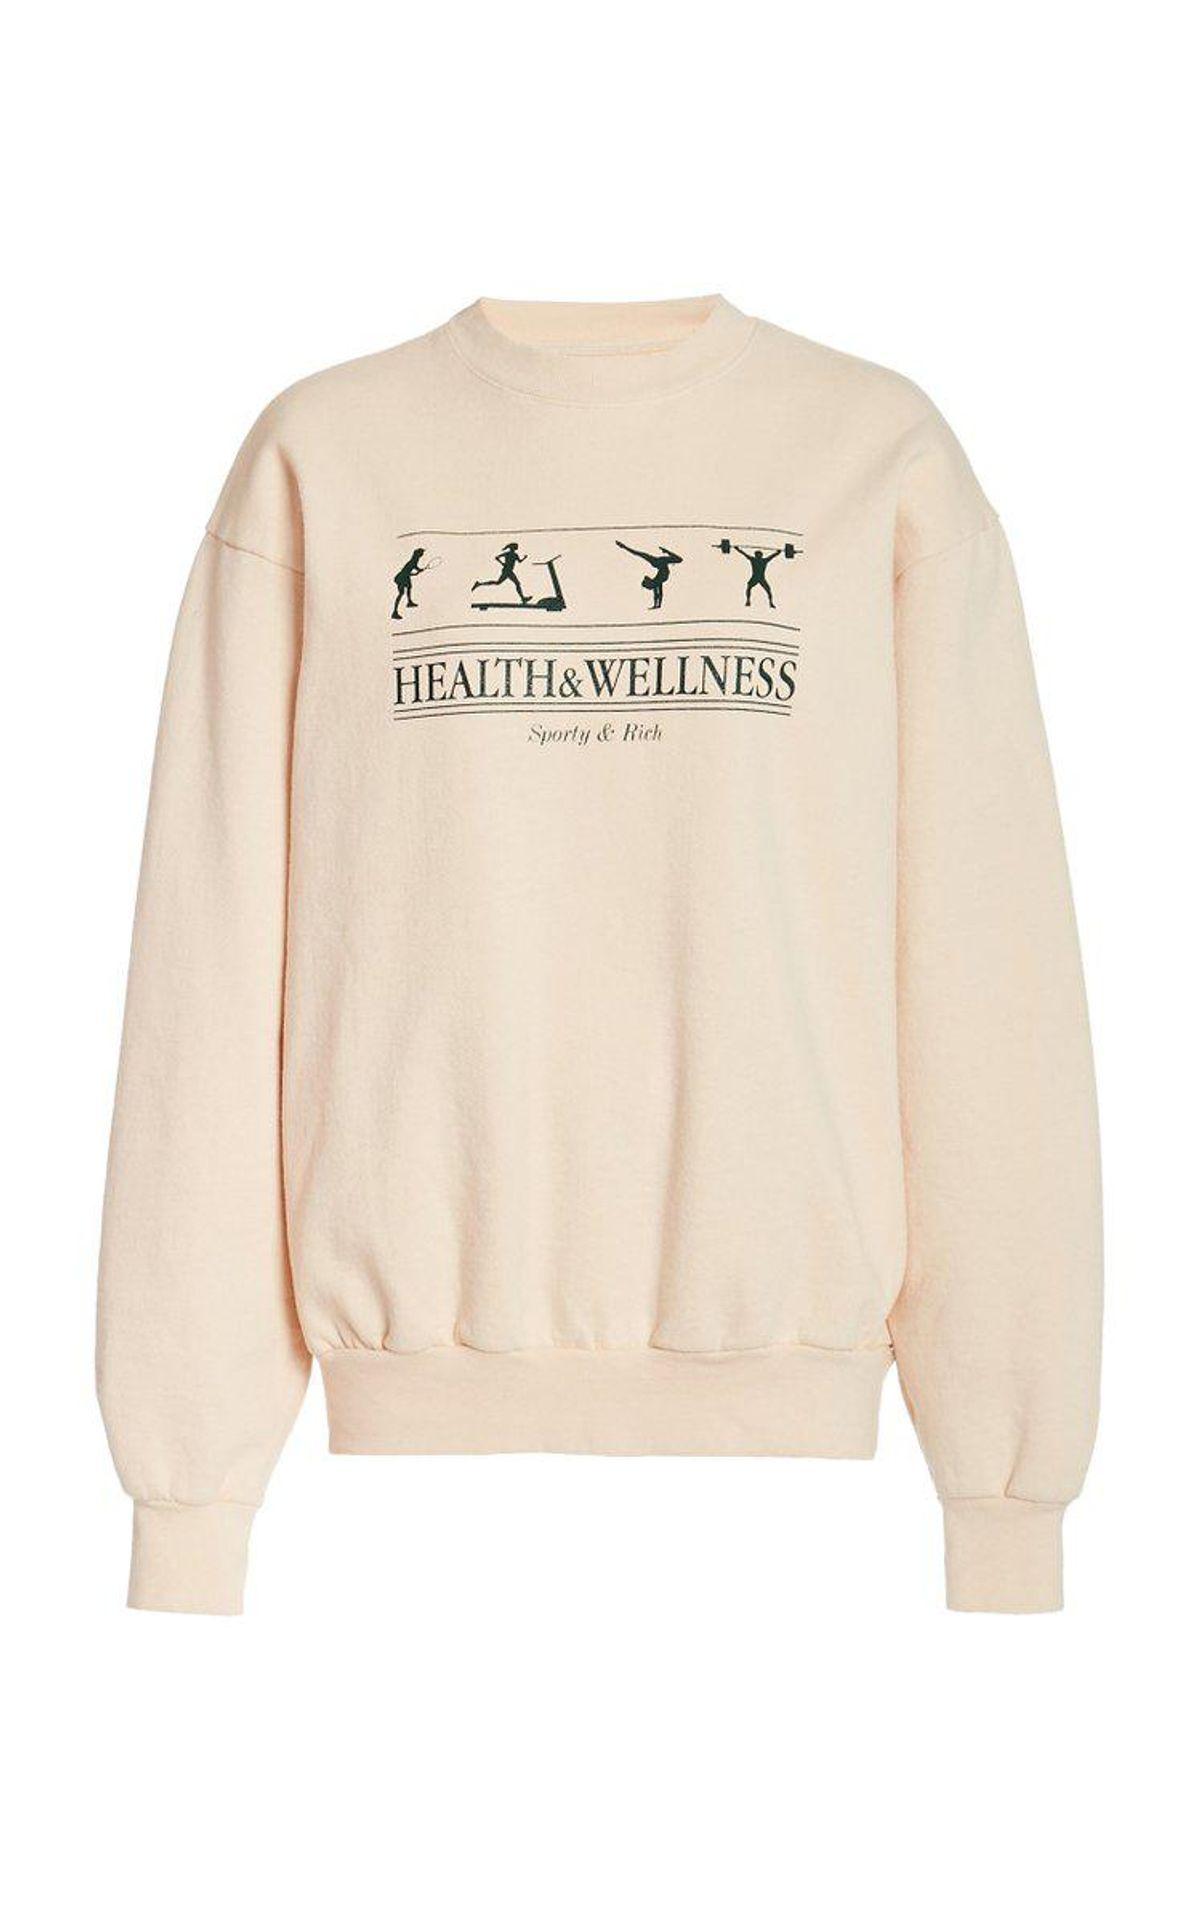 Health and Wellness Cotton Jersey Sweatshirt